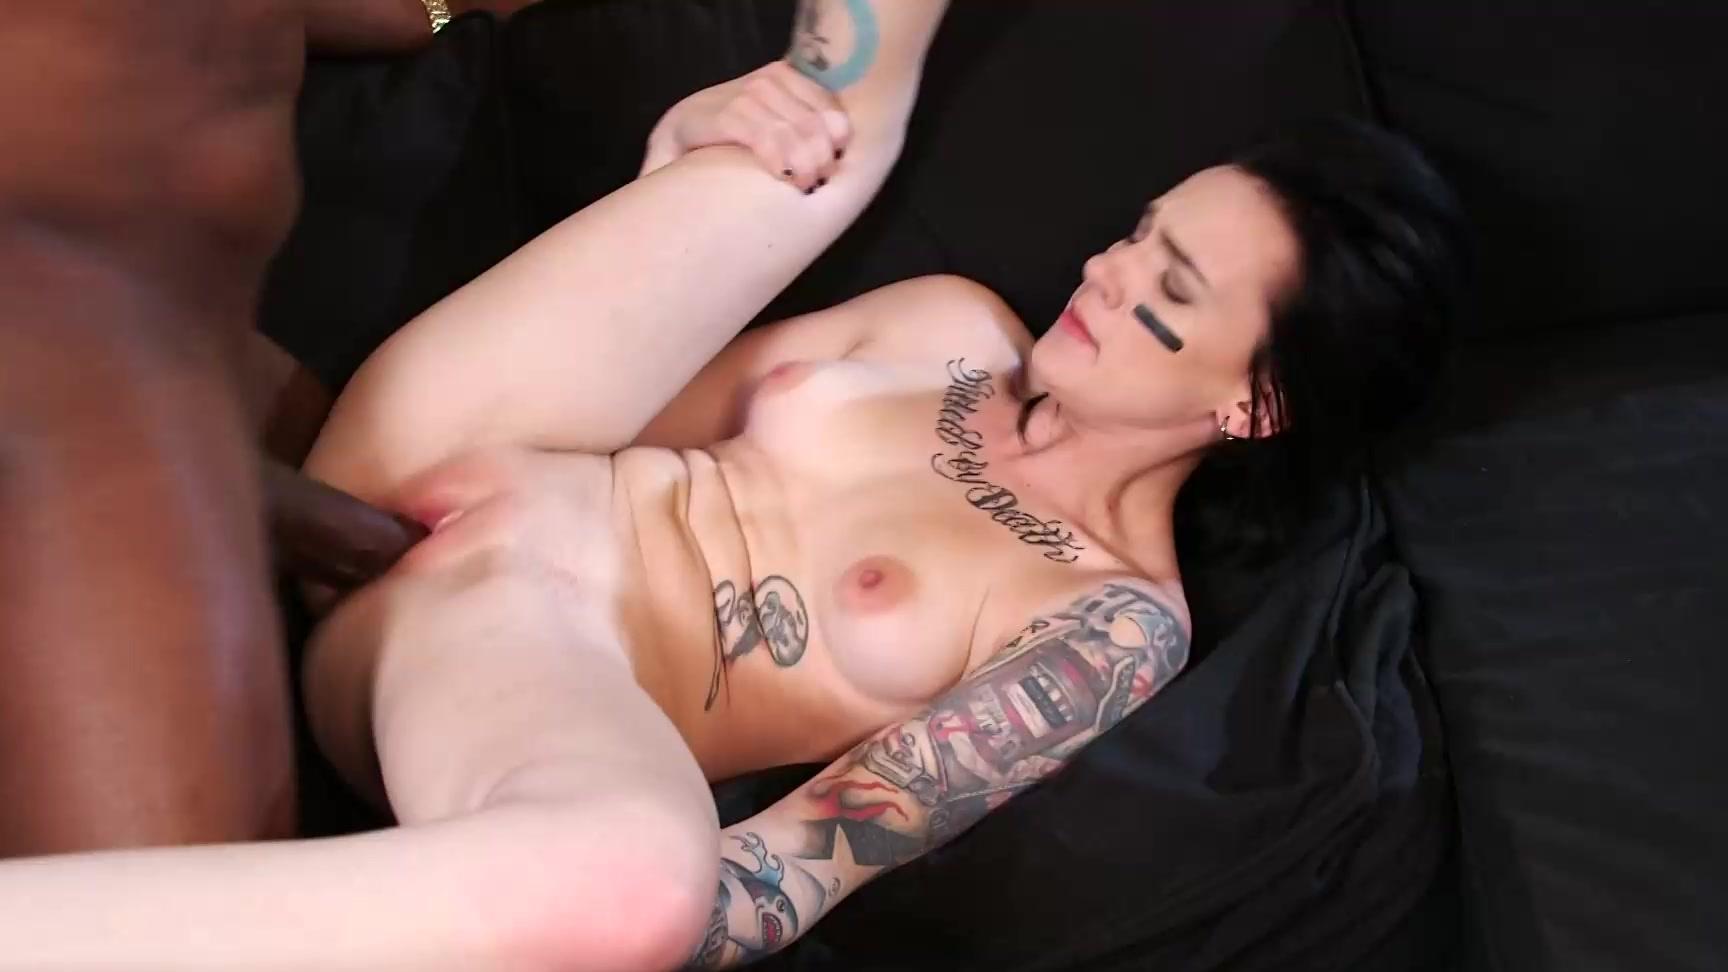 Lady gaping anus